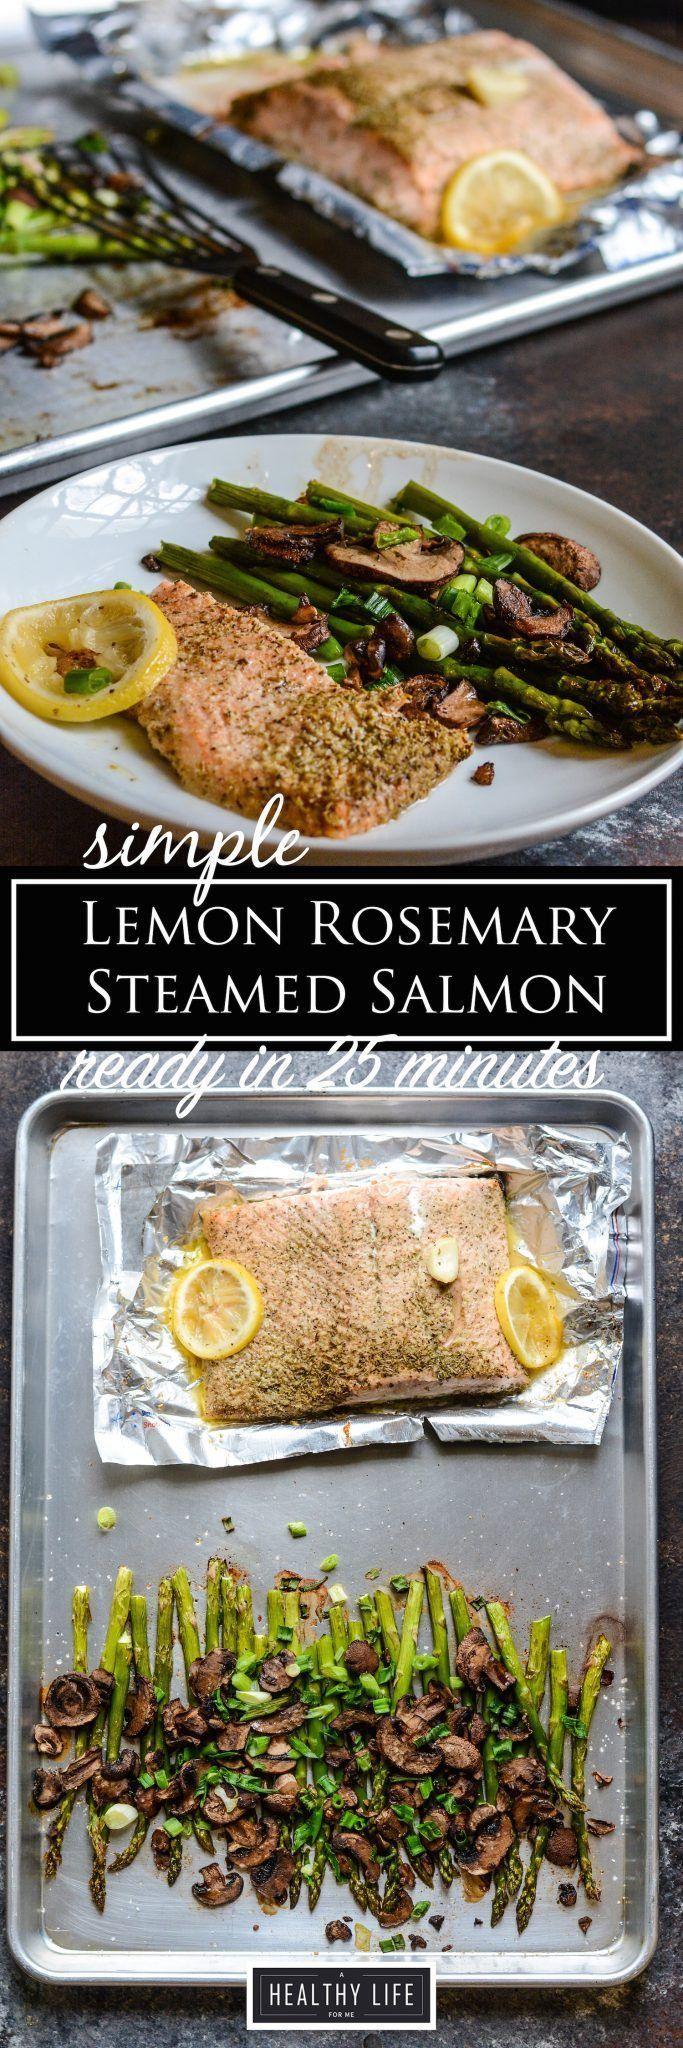 Simple Lemon Rosemary Steamed Salmon ready for you recipe |  Healthy Recipe | Seafood Recipe | Paleo Recipe | Weeknight Dinner Recipe | Easy Recipe | Salmon Recipe